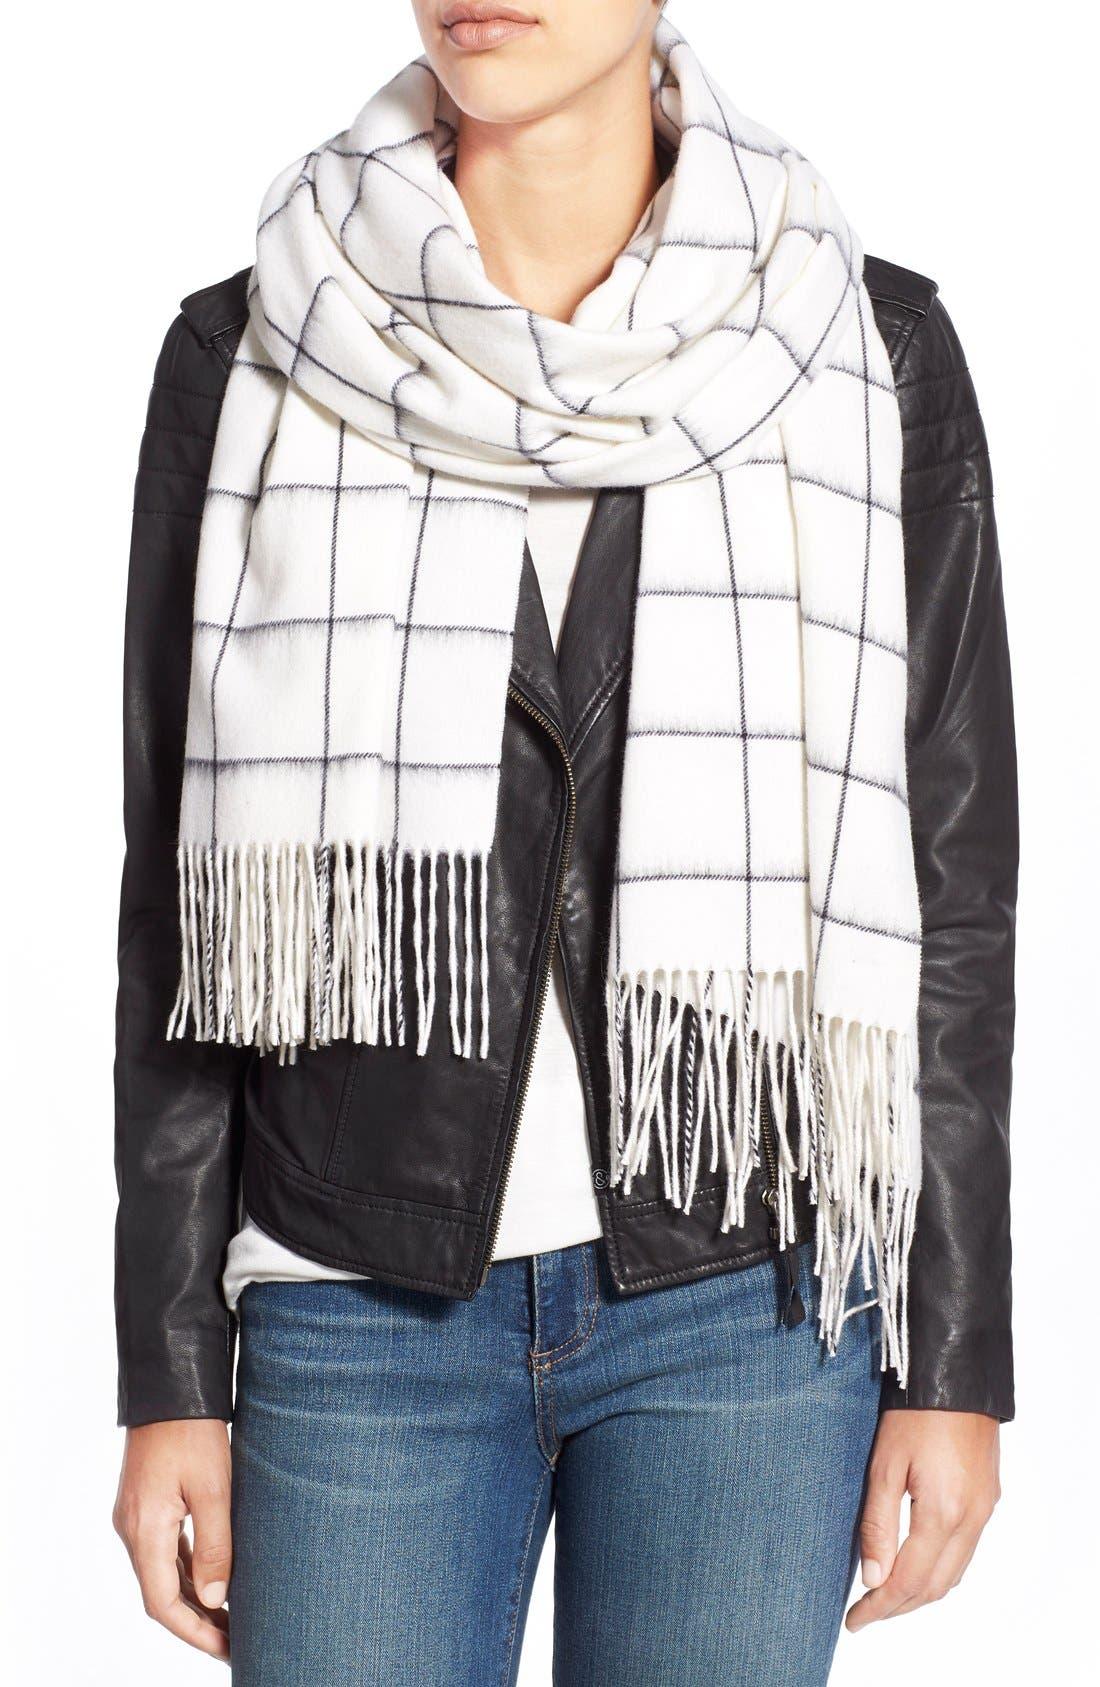 Main Image - rag & bone 'Brushed Check' Merino Wool Scarf